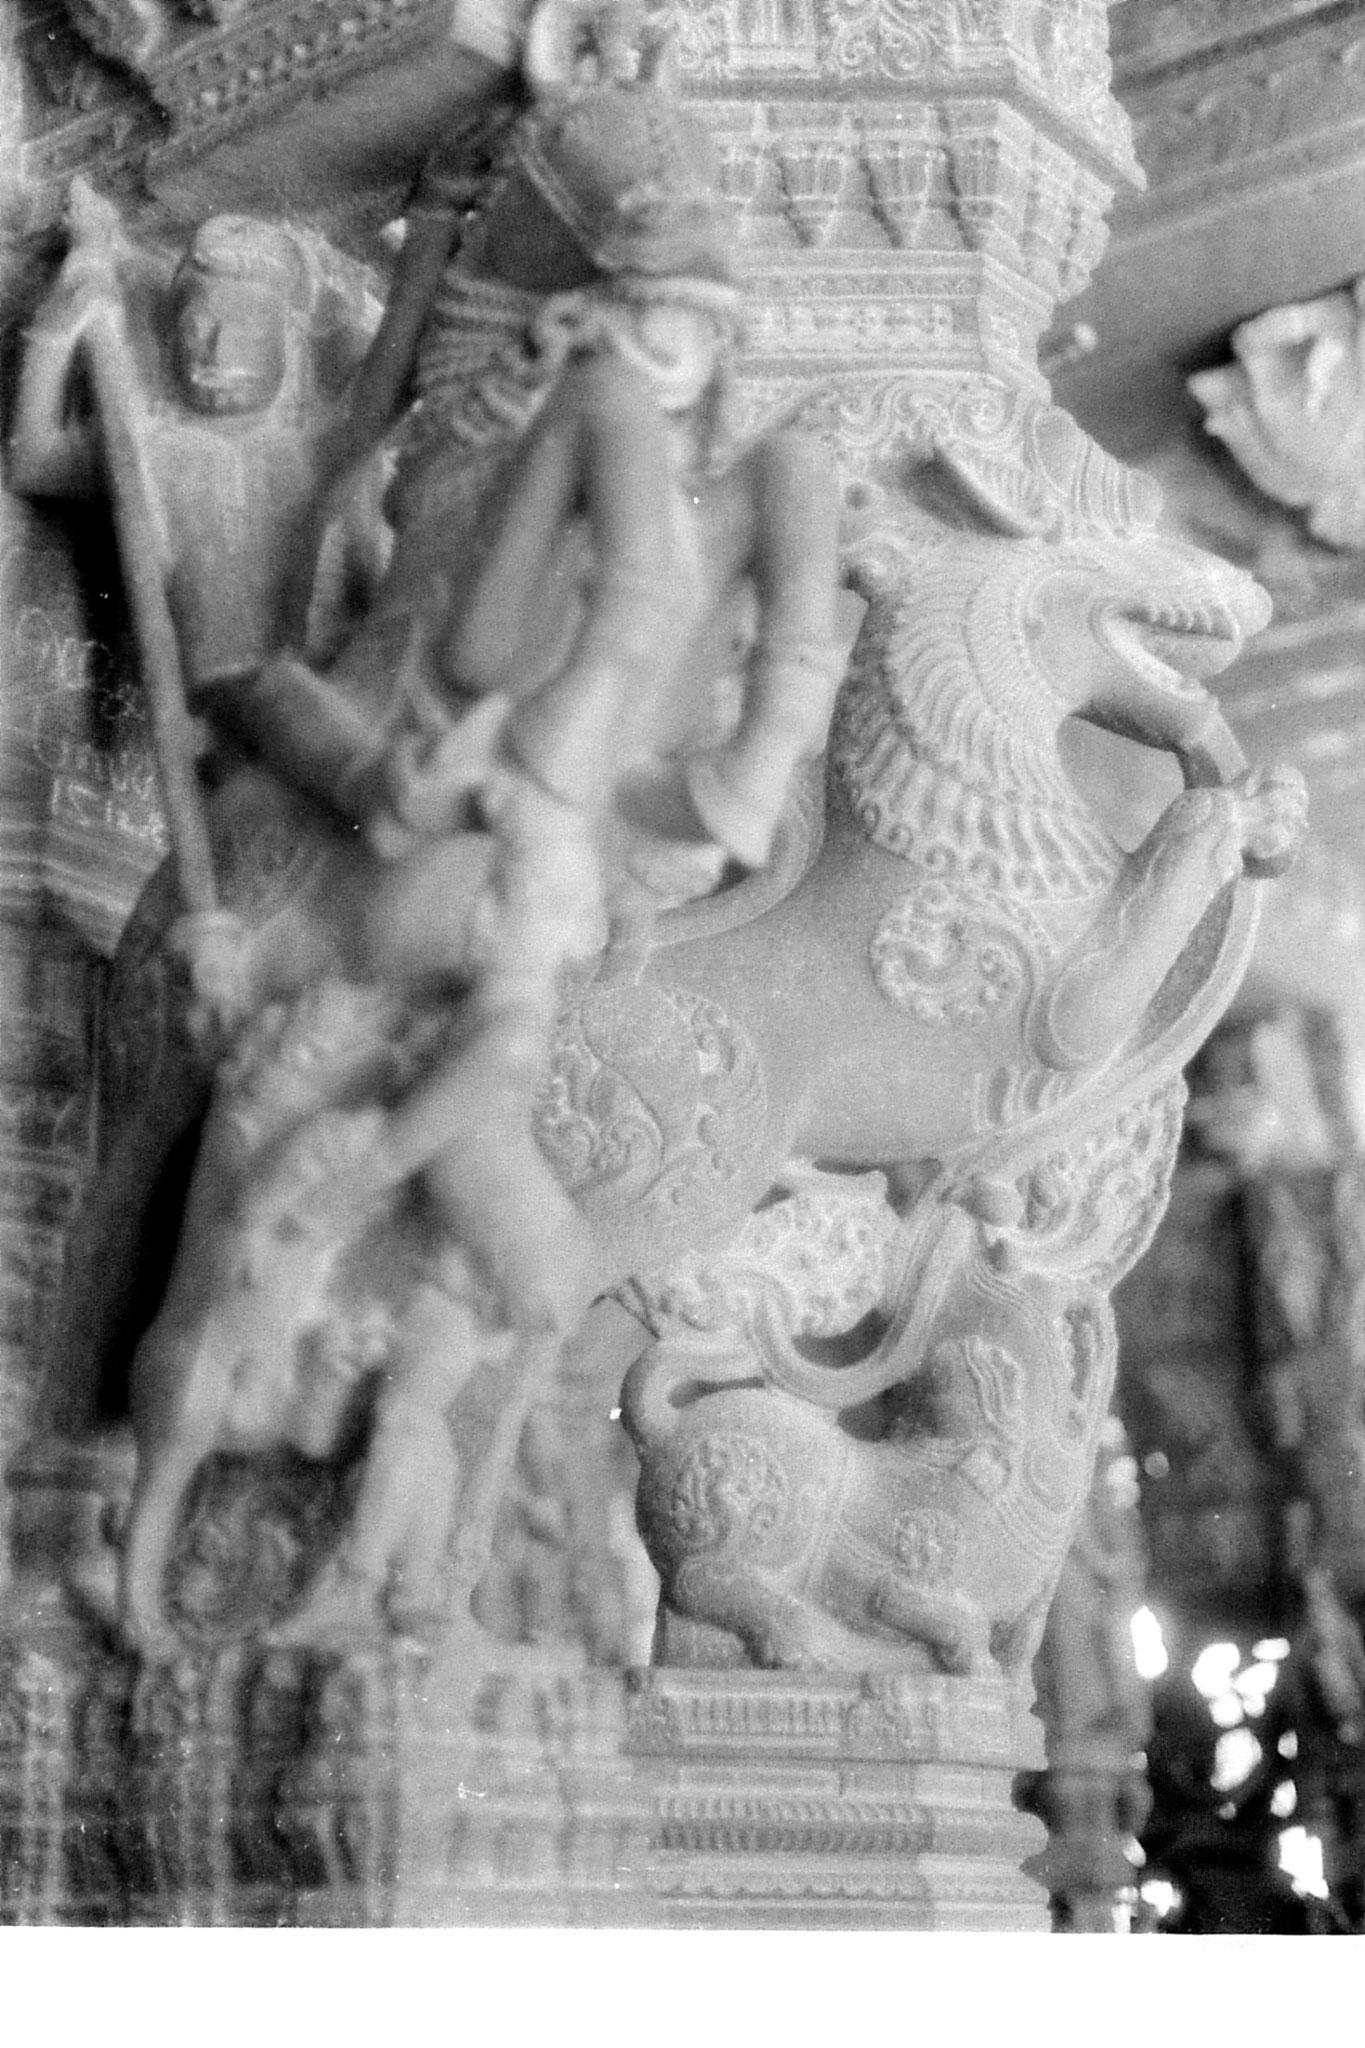 19/1/90: 20: Kanchipuram - Varadharaja Perumal - mandapa for wedding between gods